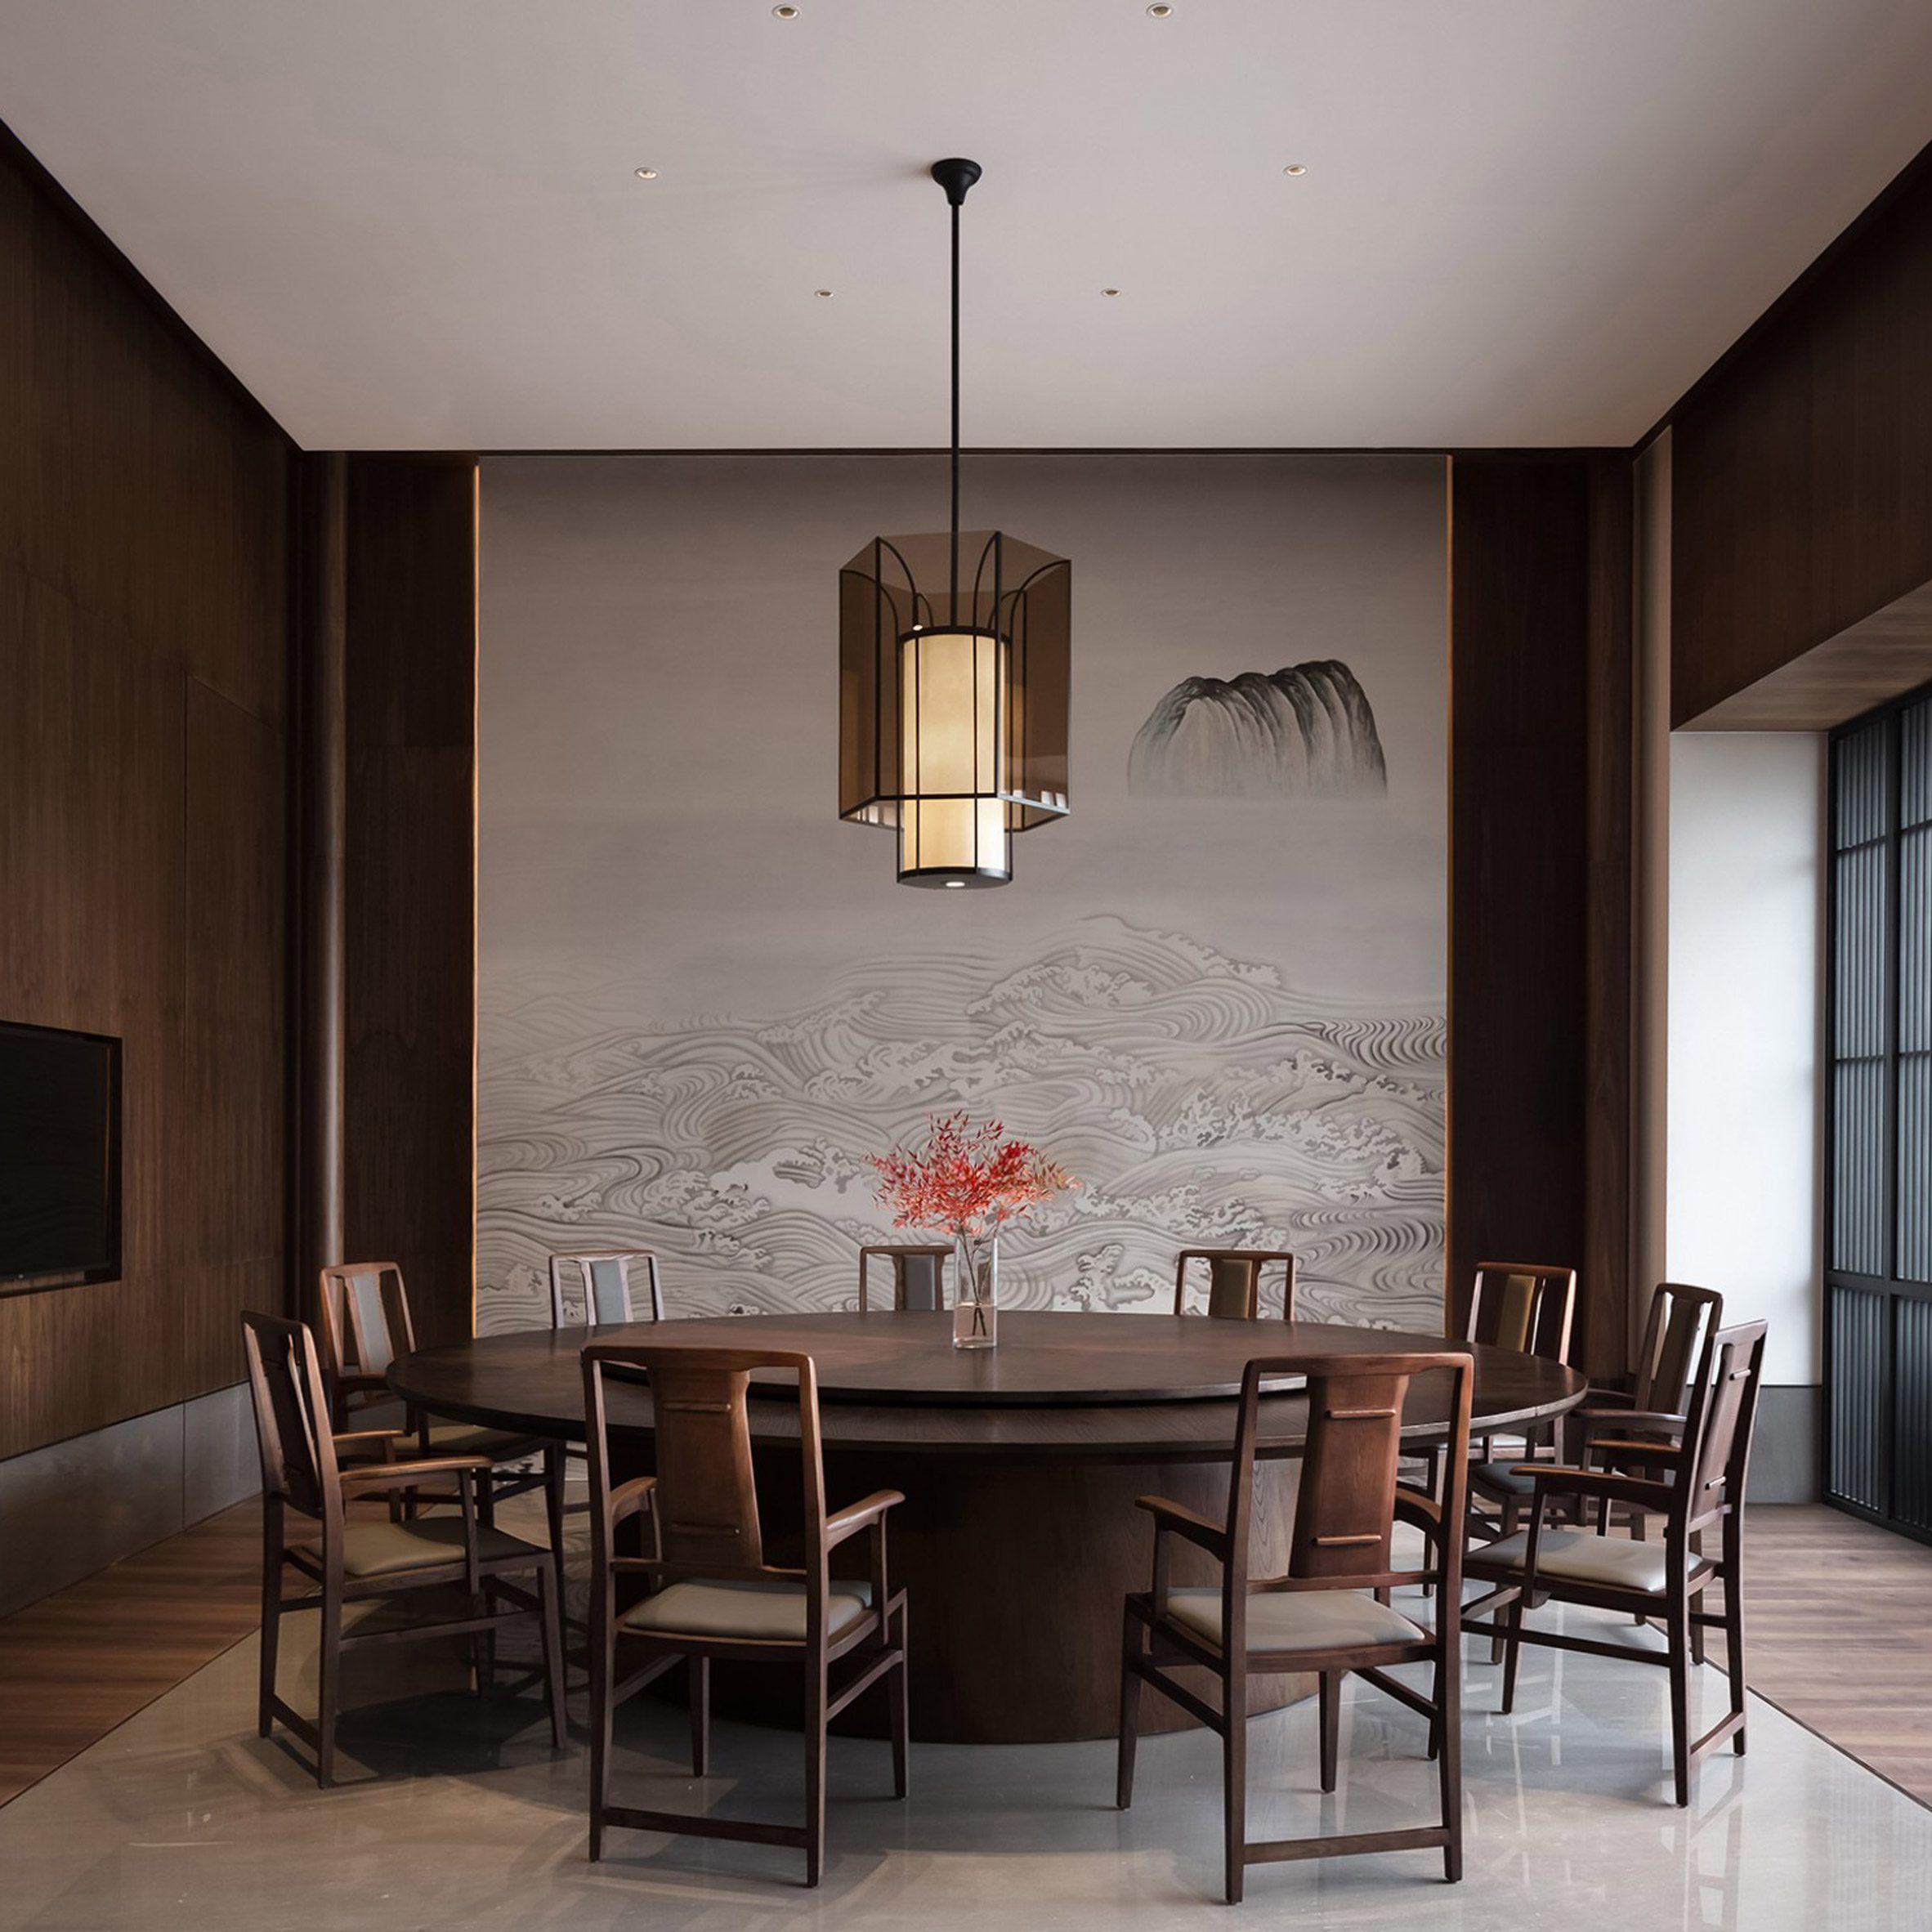 JG Phoenix references Tang dynasty architecture in minimalist Shantou restaurant